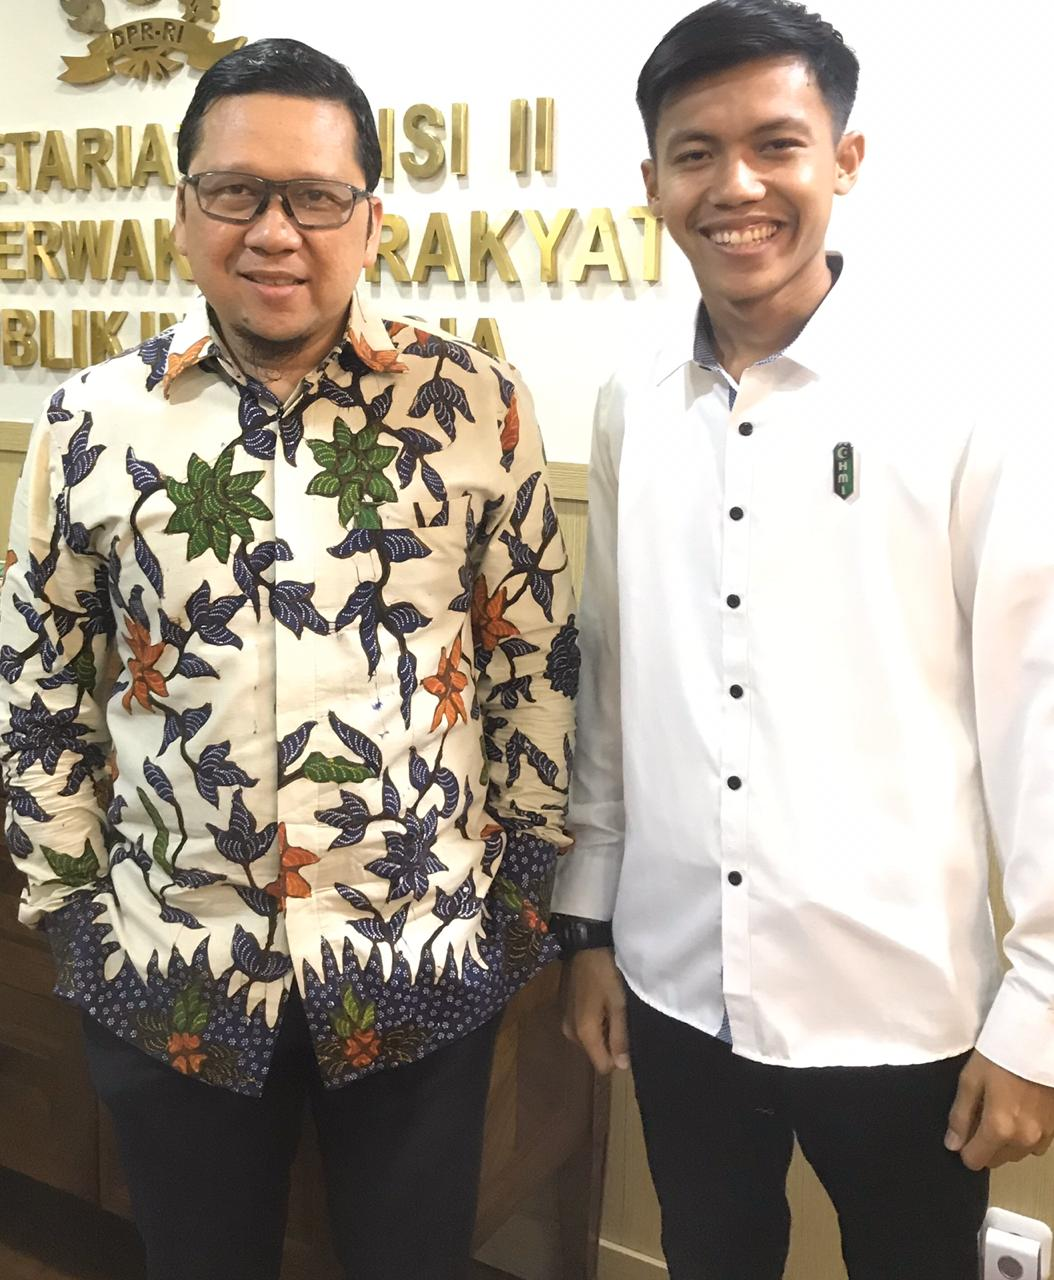 Pilkada Serentak Ditunda, HMI Lampung Apresiasi Langkah DPR RI